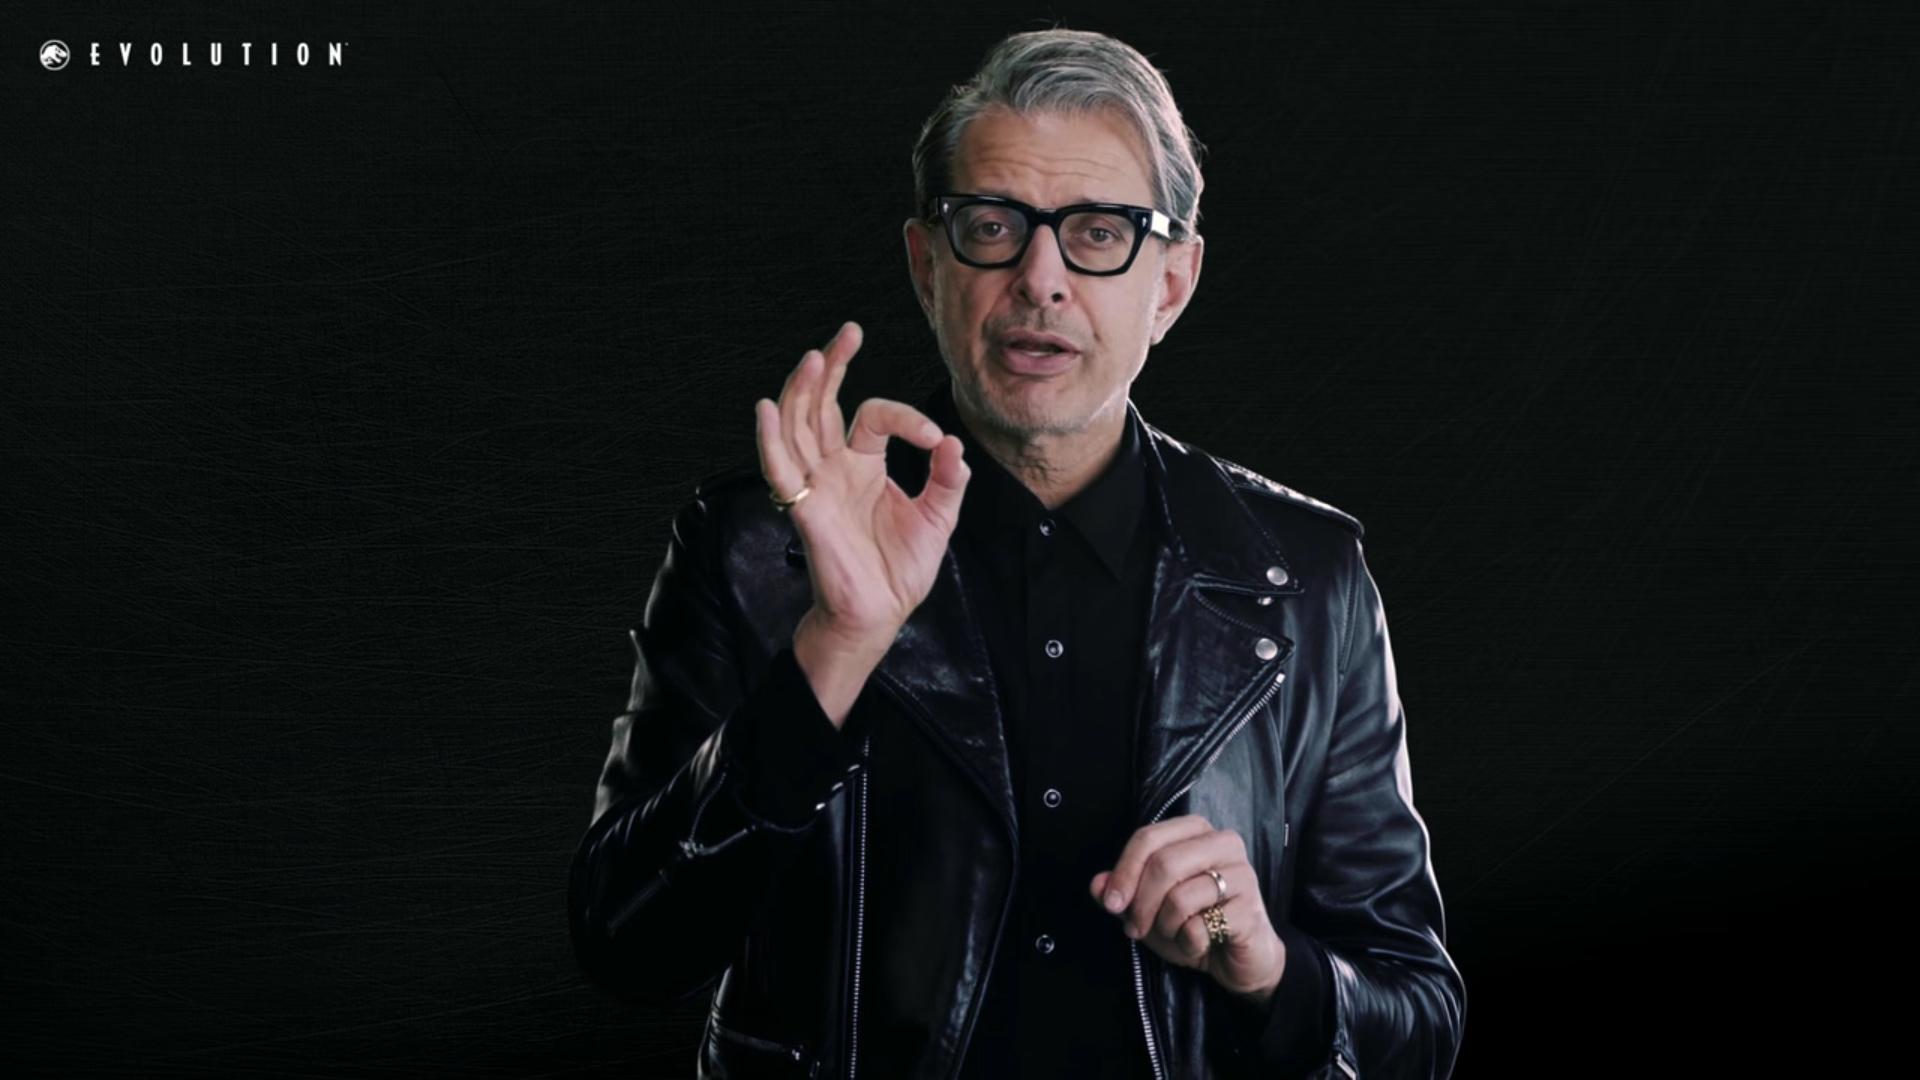 Hell yeah, Jeff Goldblum is in Jurassic World Evolution screenshot